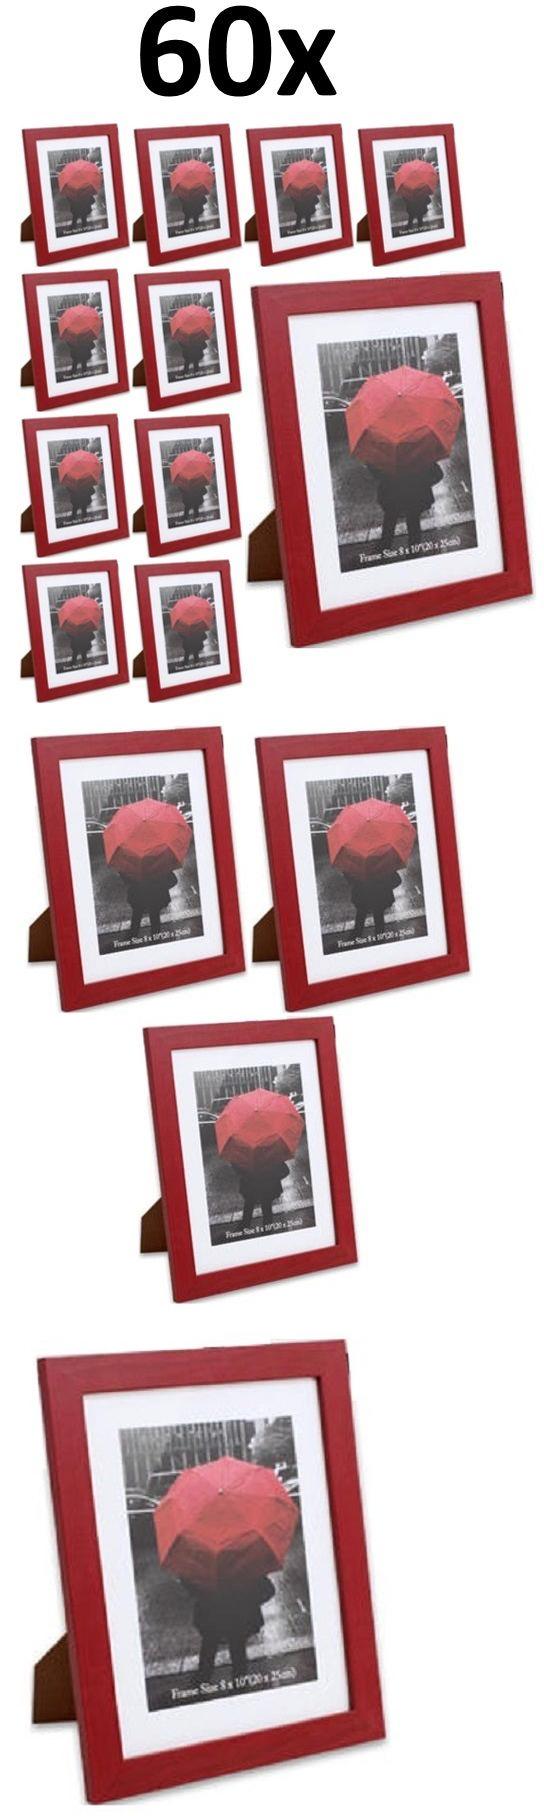 Frames 79654: 60-Pack 8X10 Wood Photo Picture Frame, Red Color, Desk ...